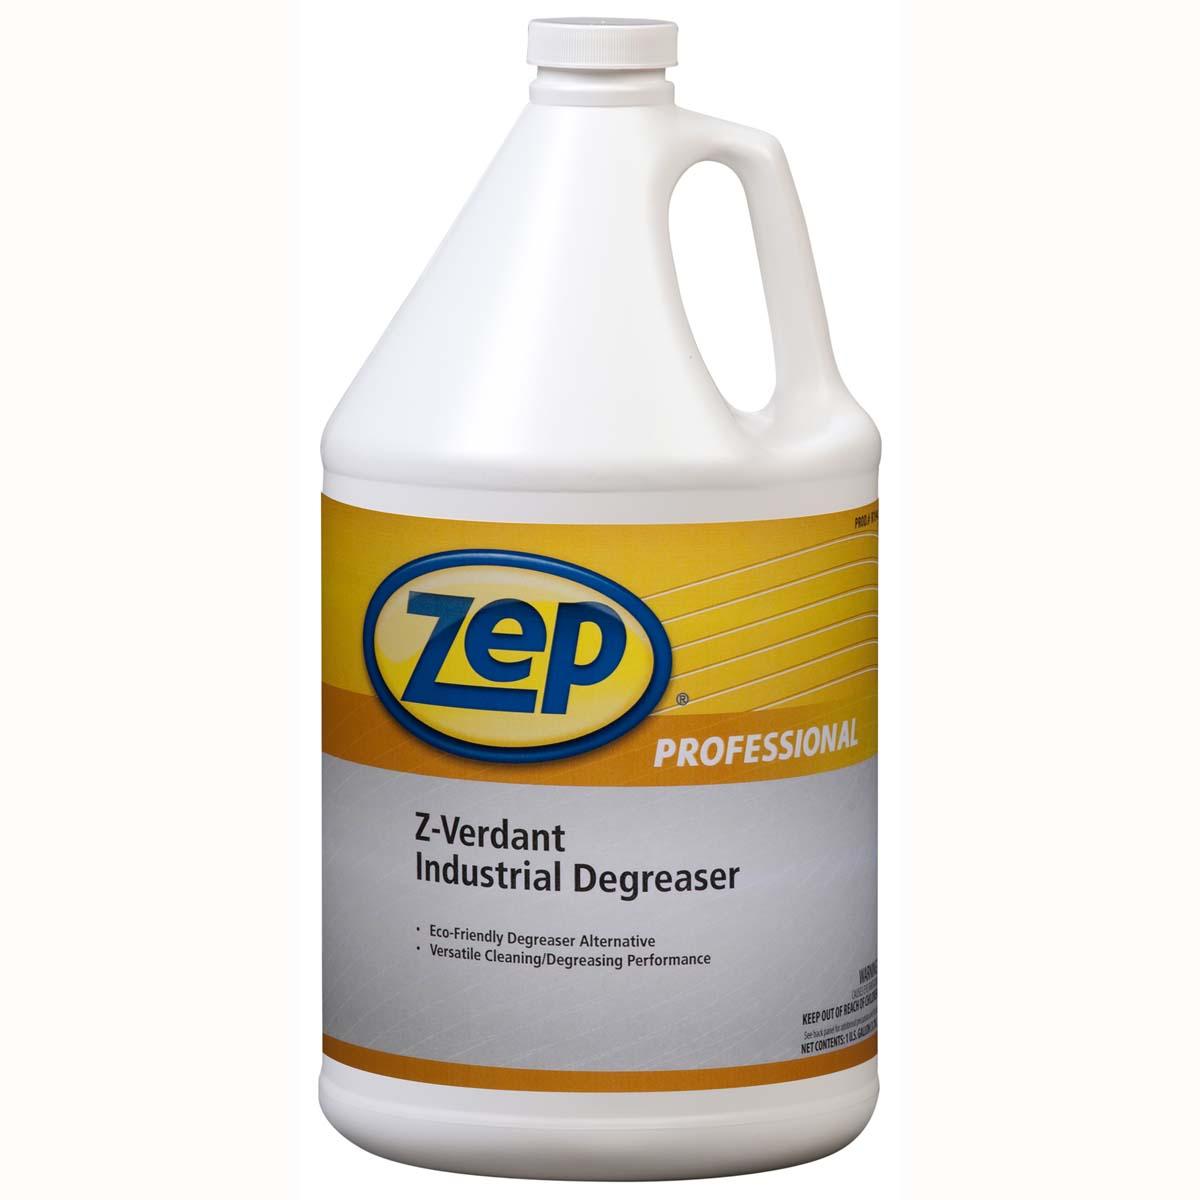 ZEP Z-Verdant Industrial Degreaser